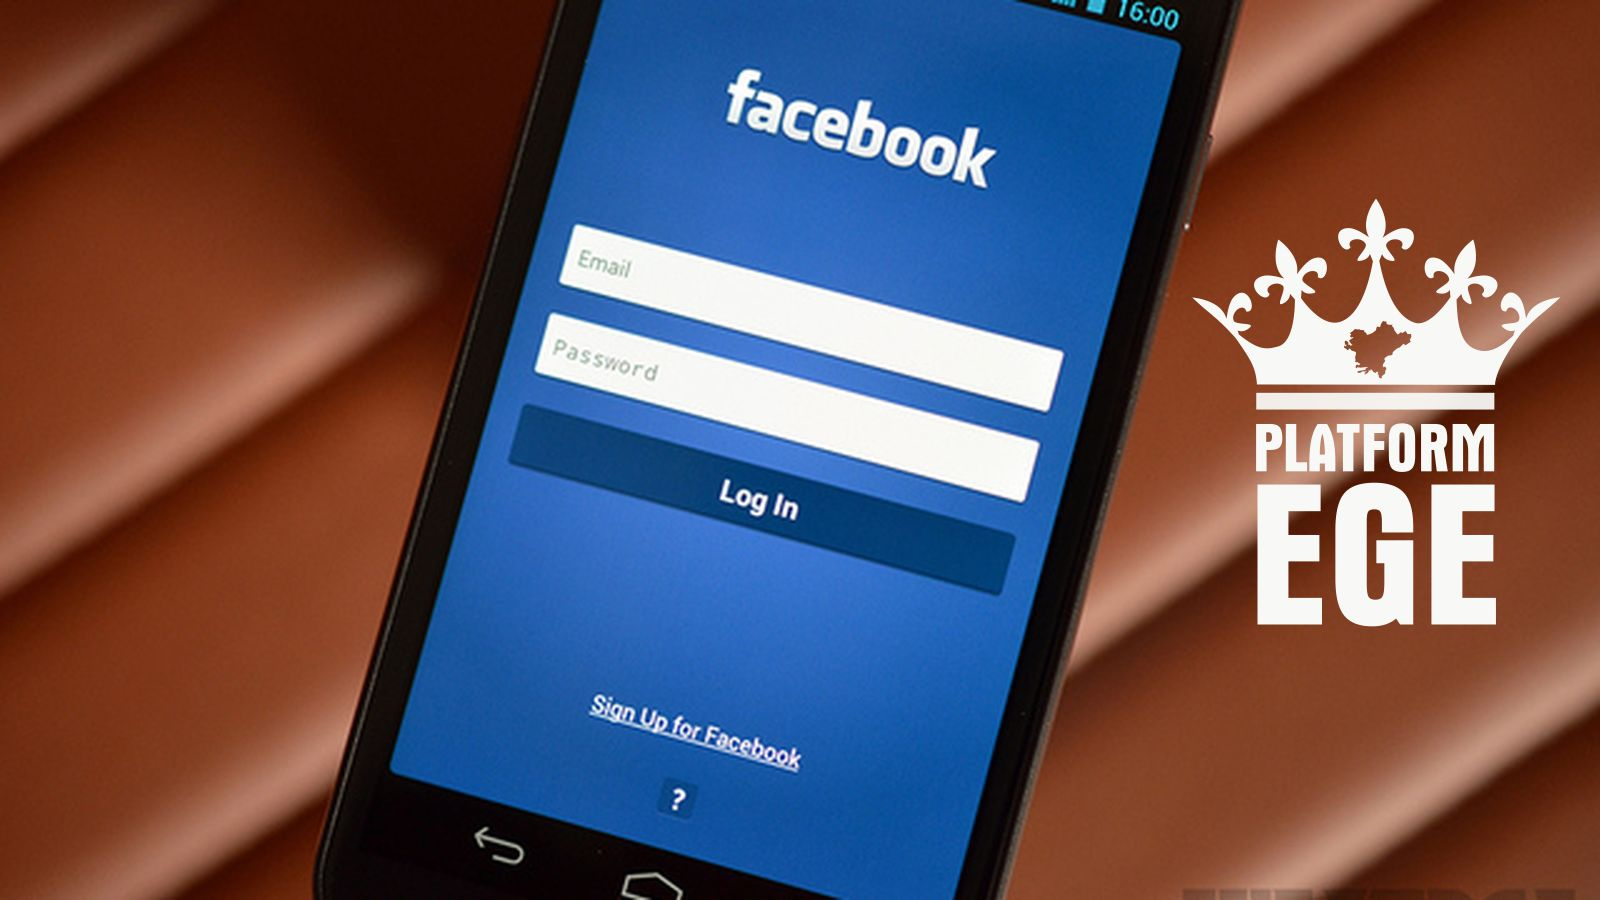 facebook-android-log-in_1020_large_verge_medium_landscape0